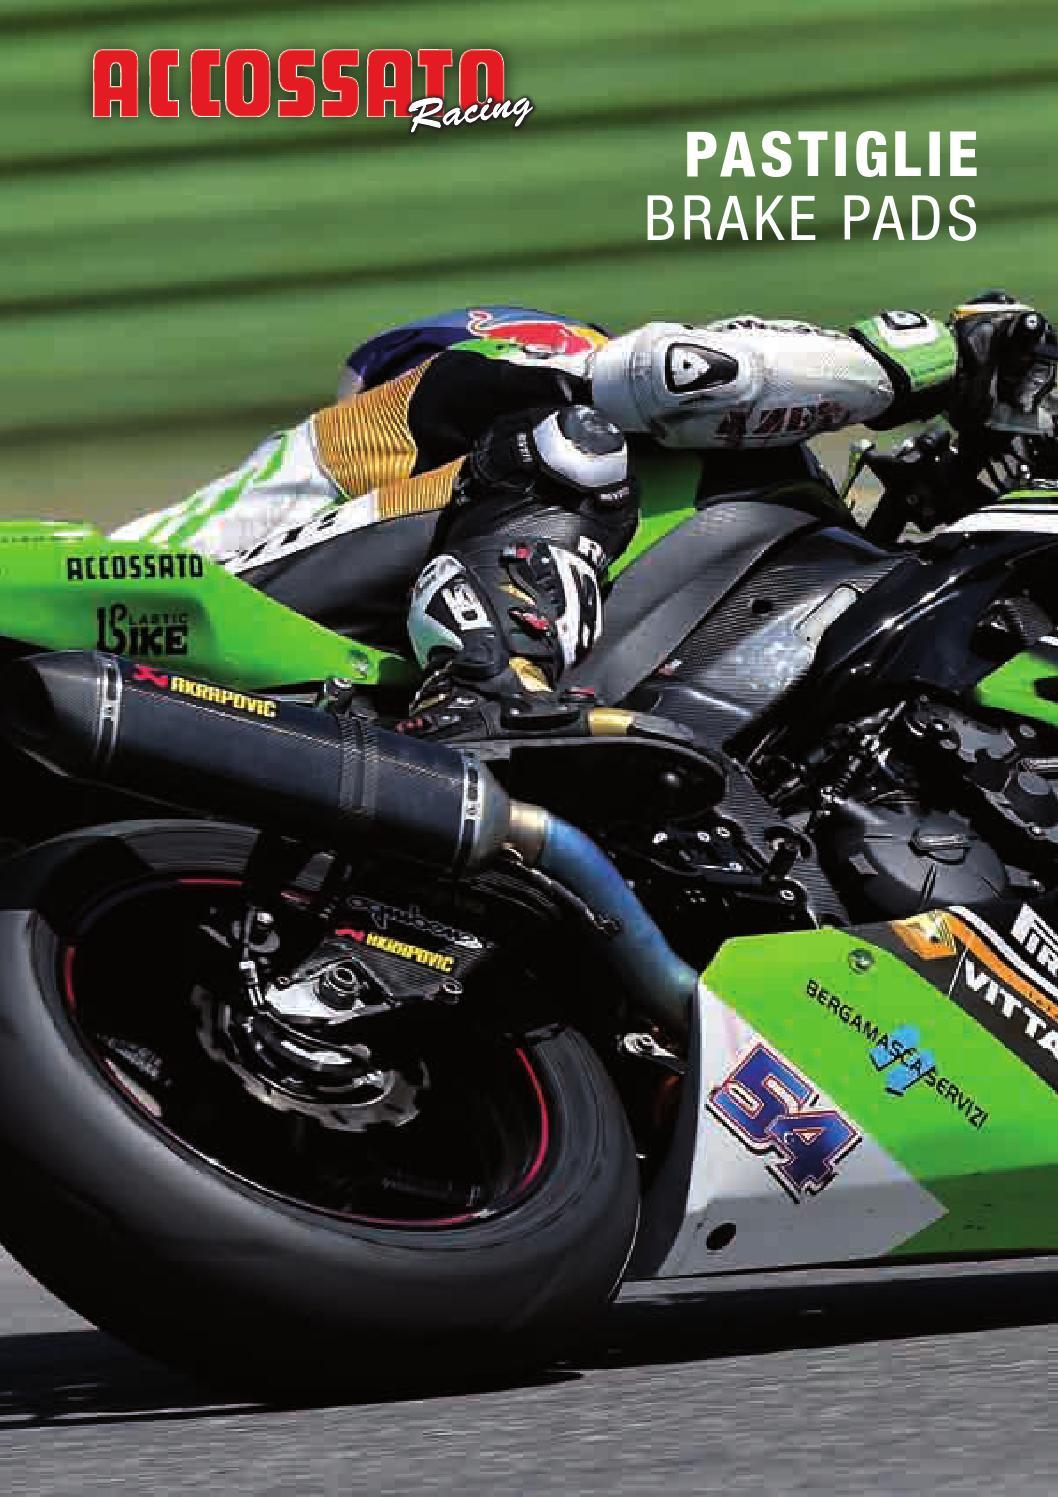 Brake Pads FA408 Rear For Yamaha YP400 S Majesty 2004-2012 K